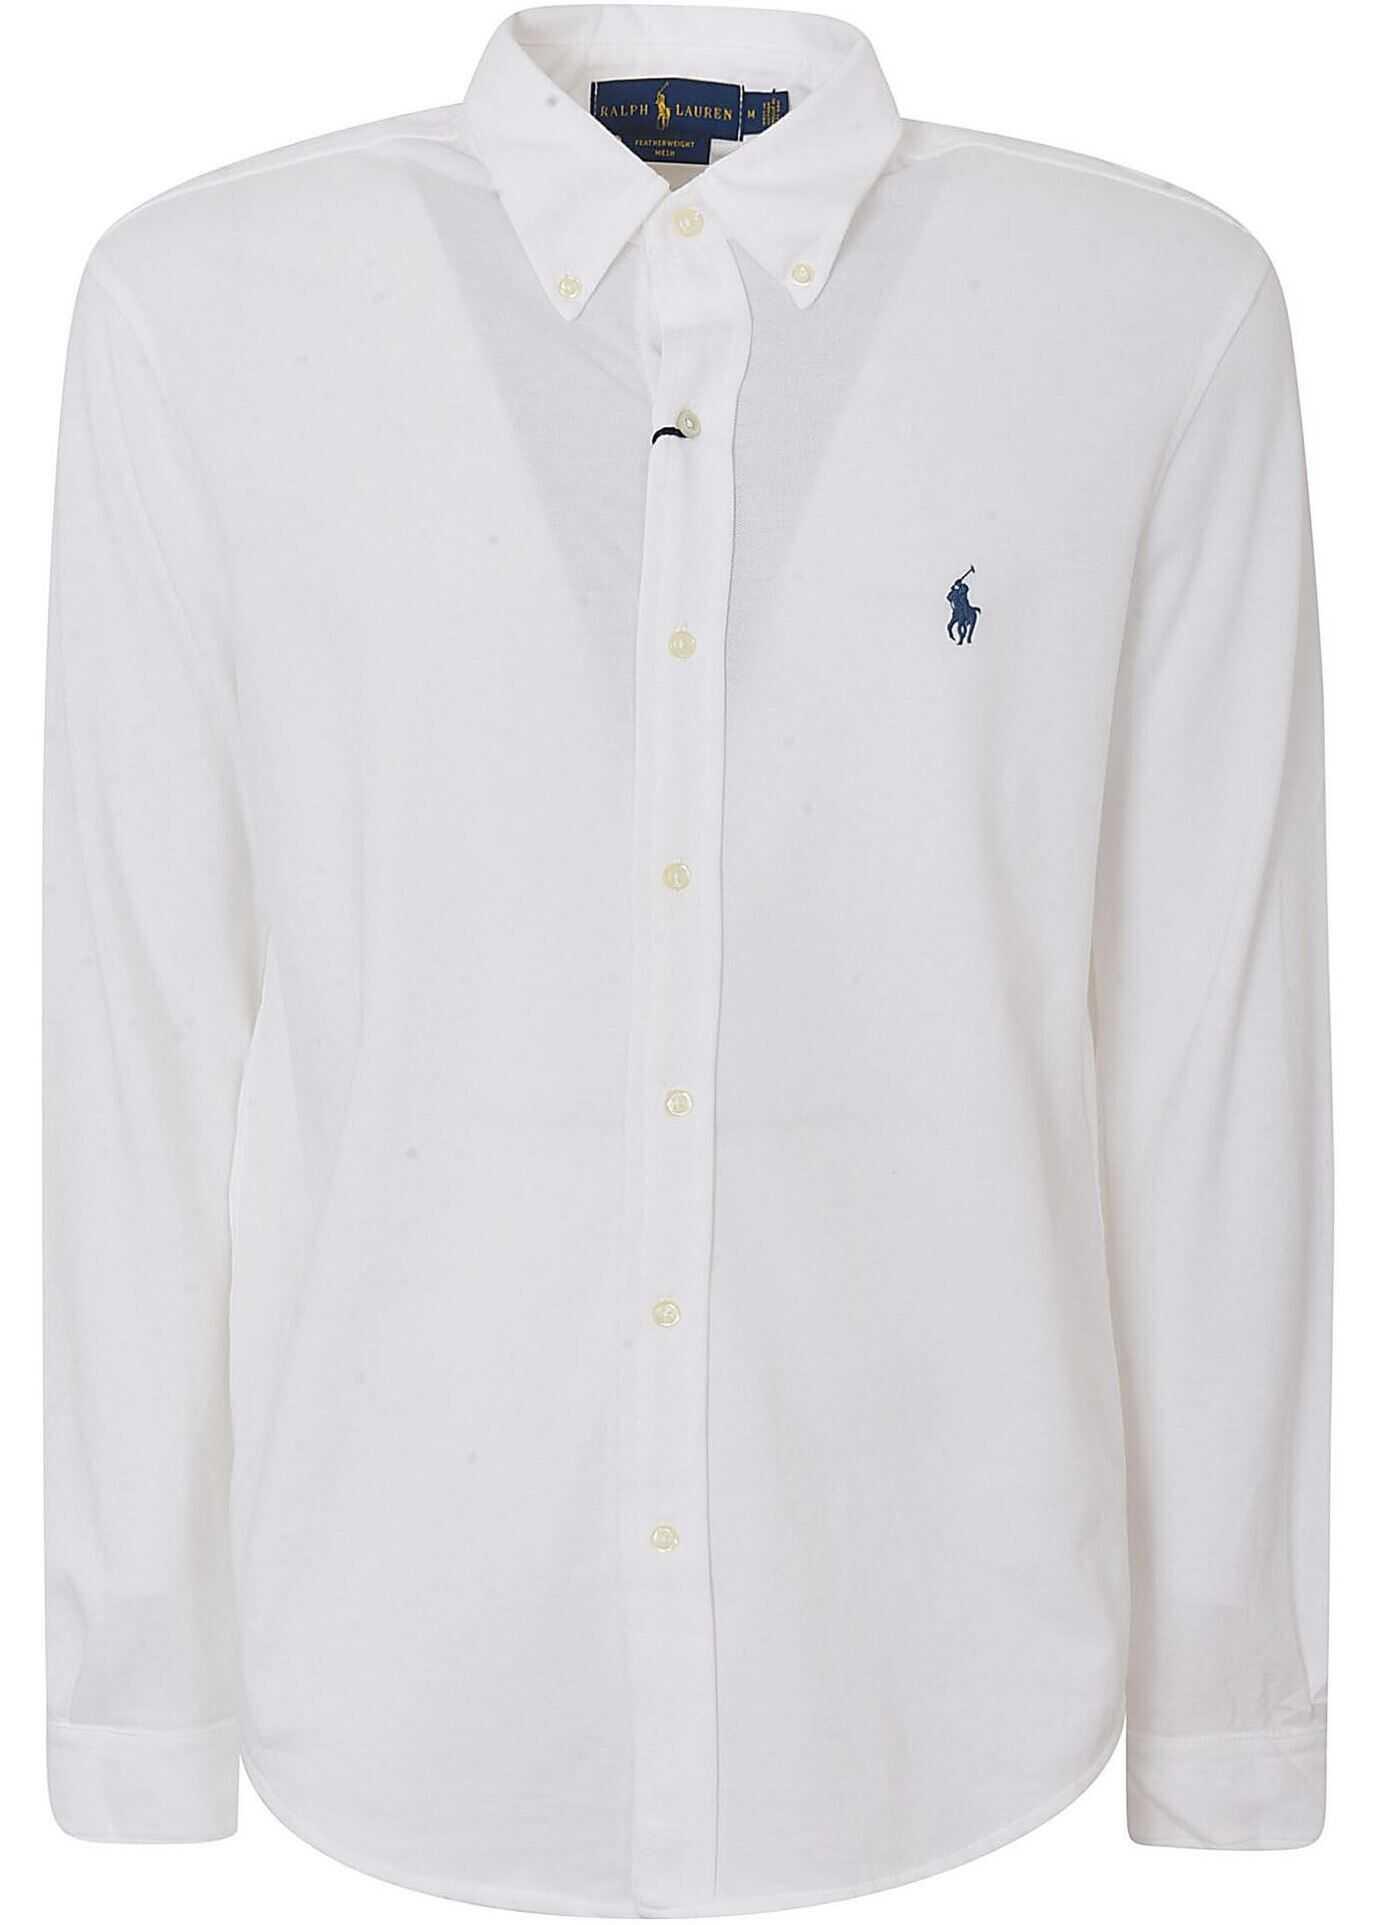 Ralph Lauren Ralph Lauren Shirt In White White imagine